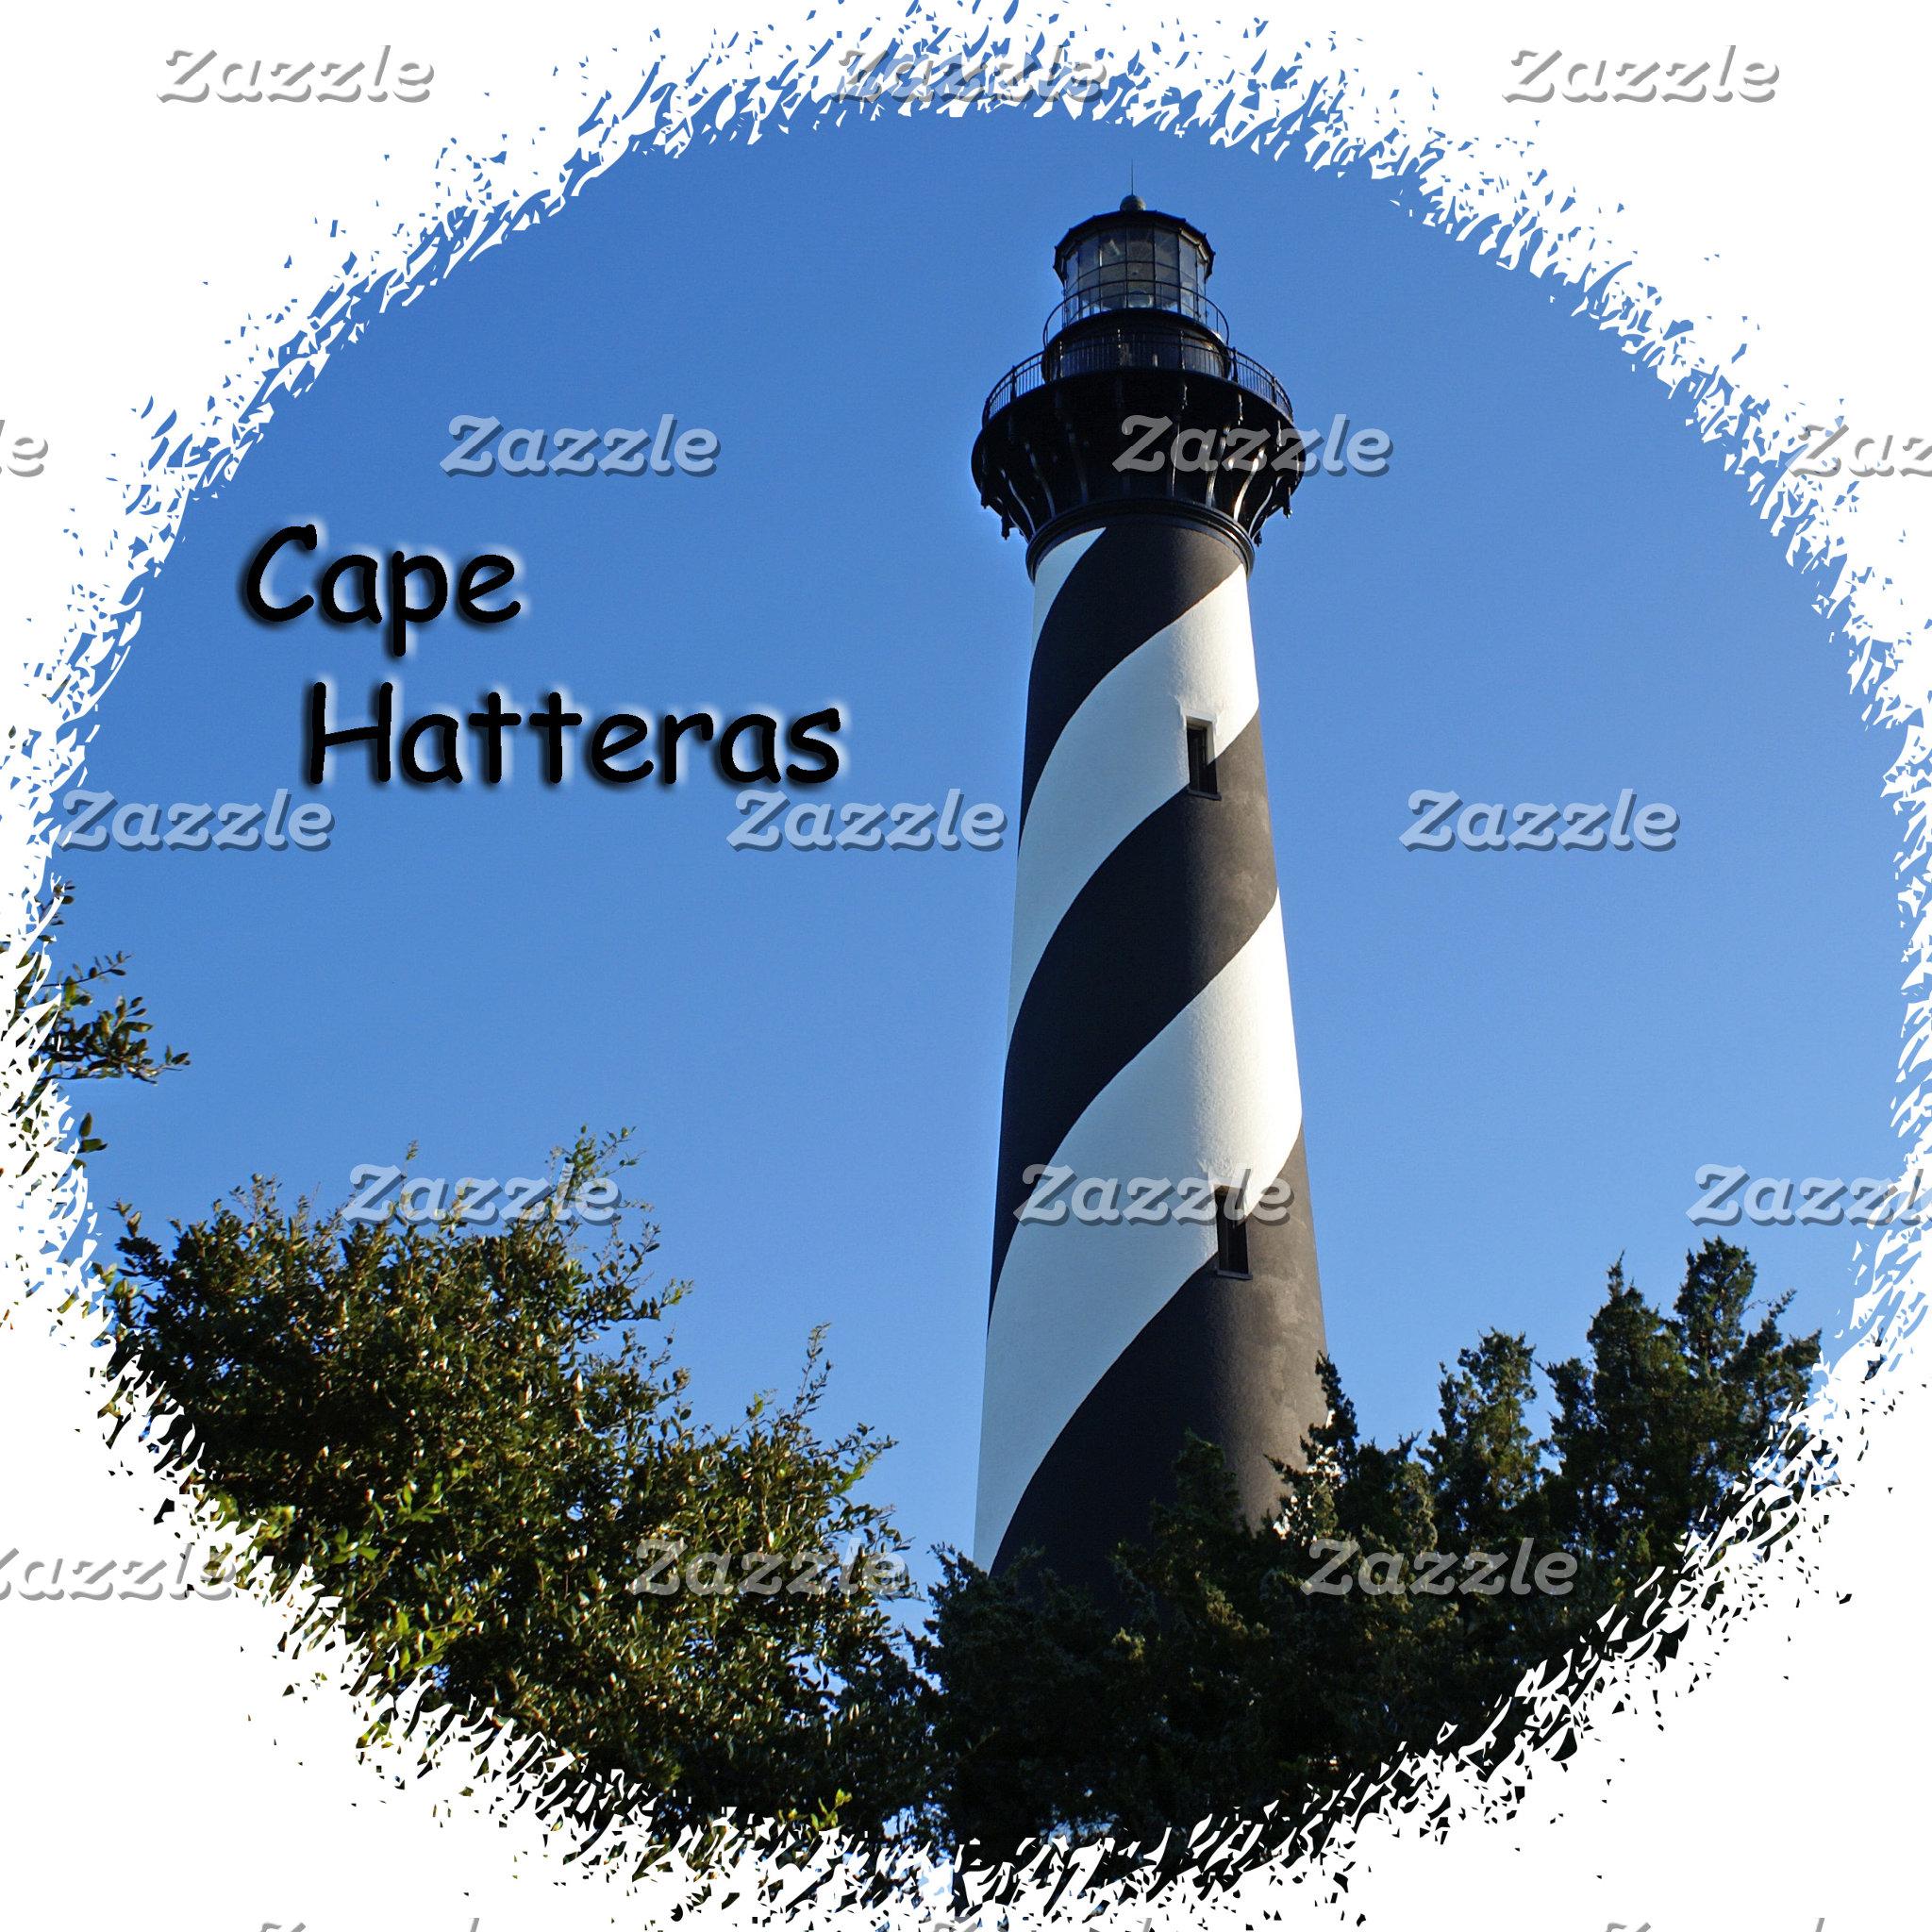 Cape Hatteras